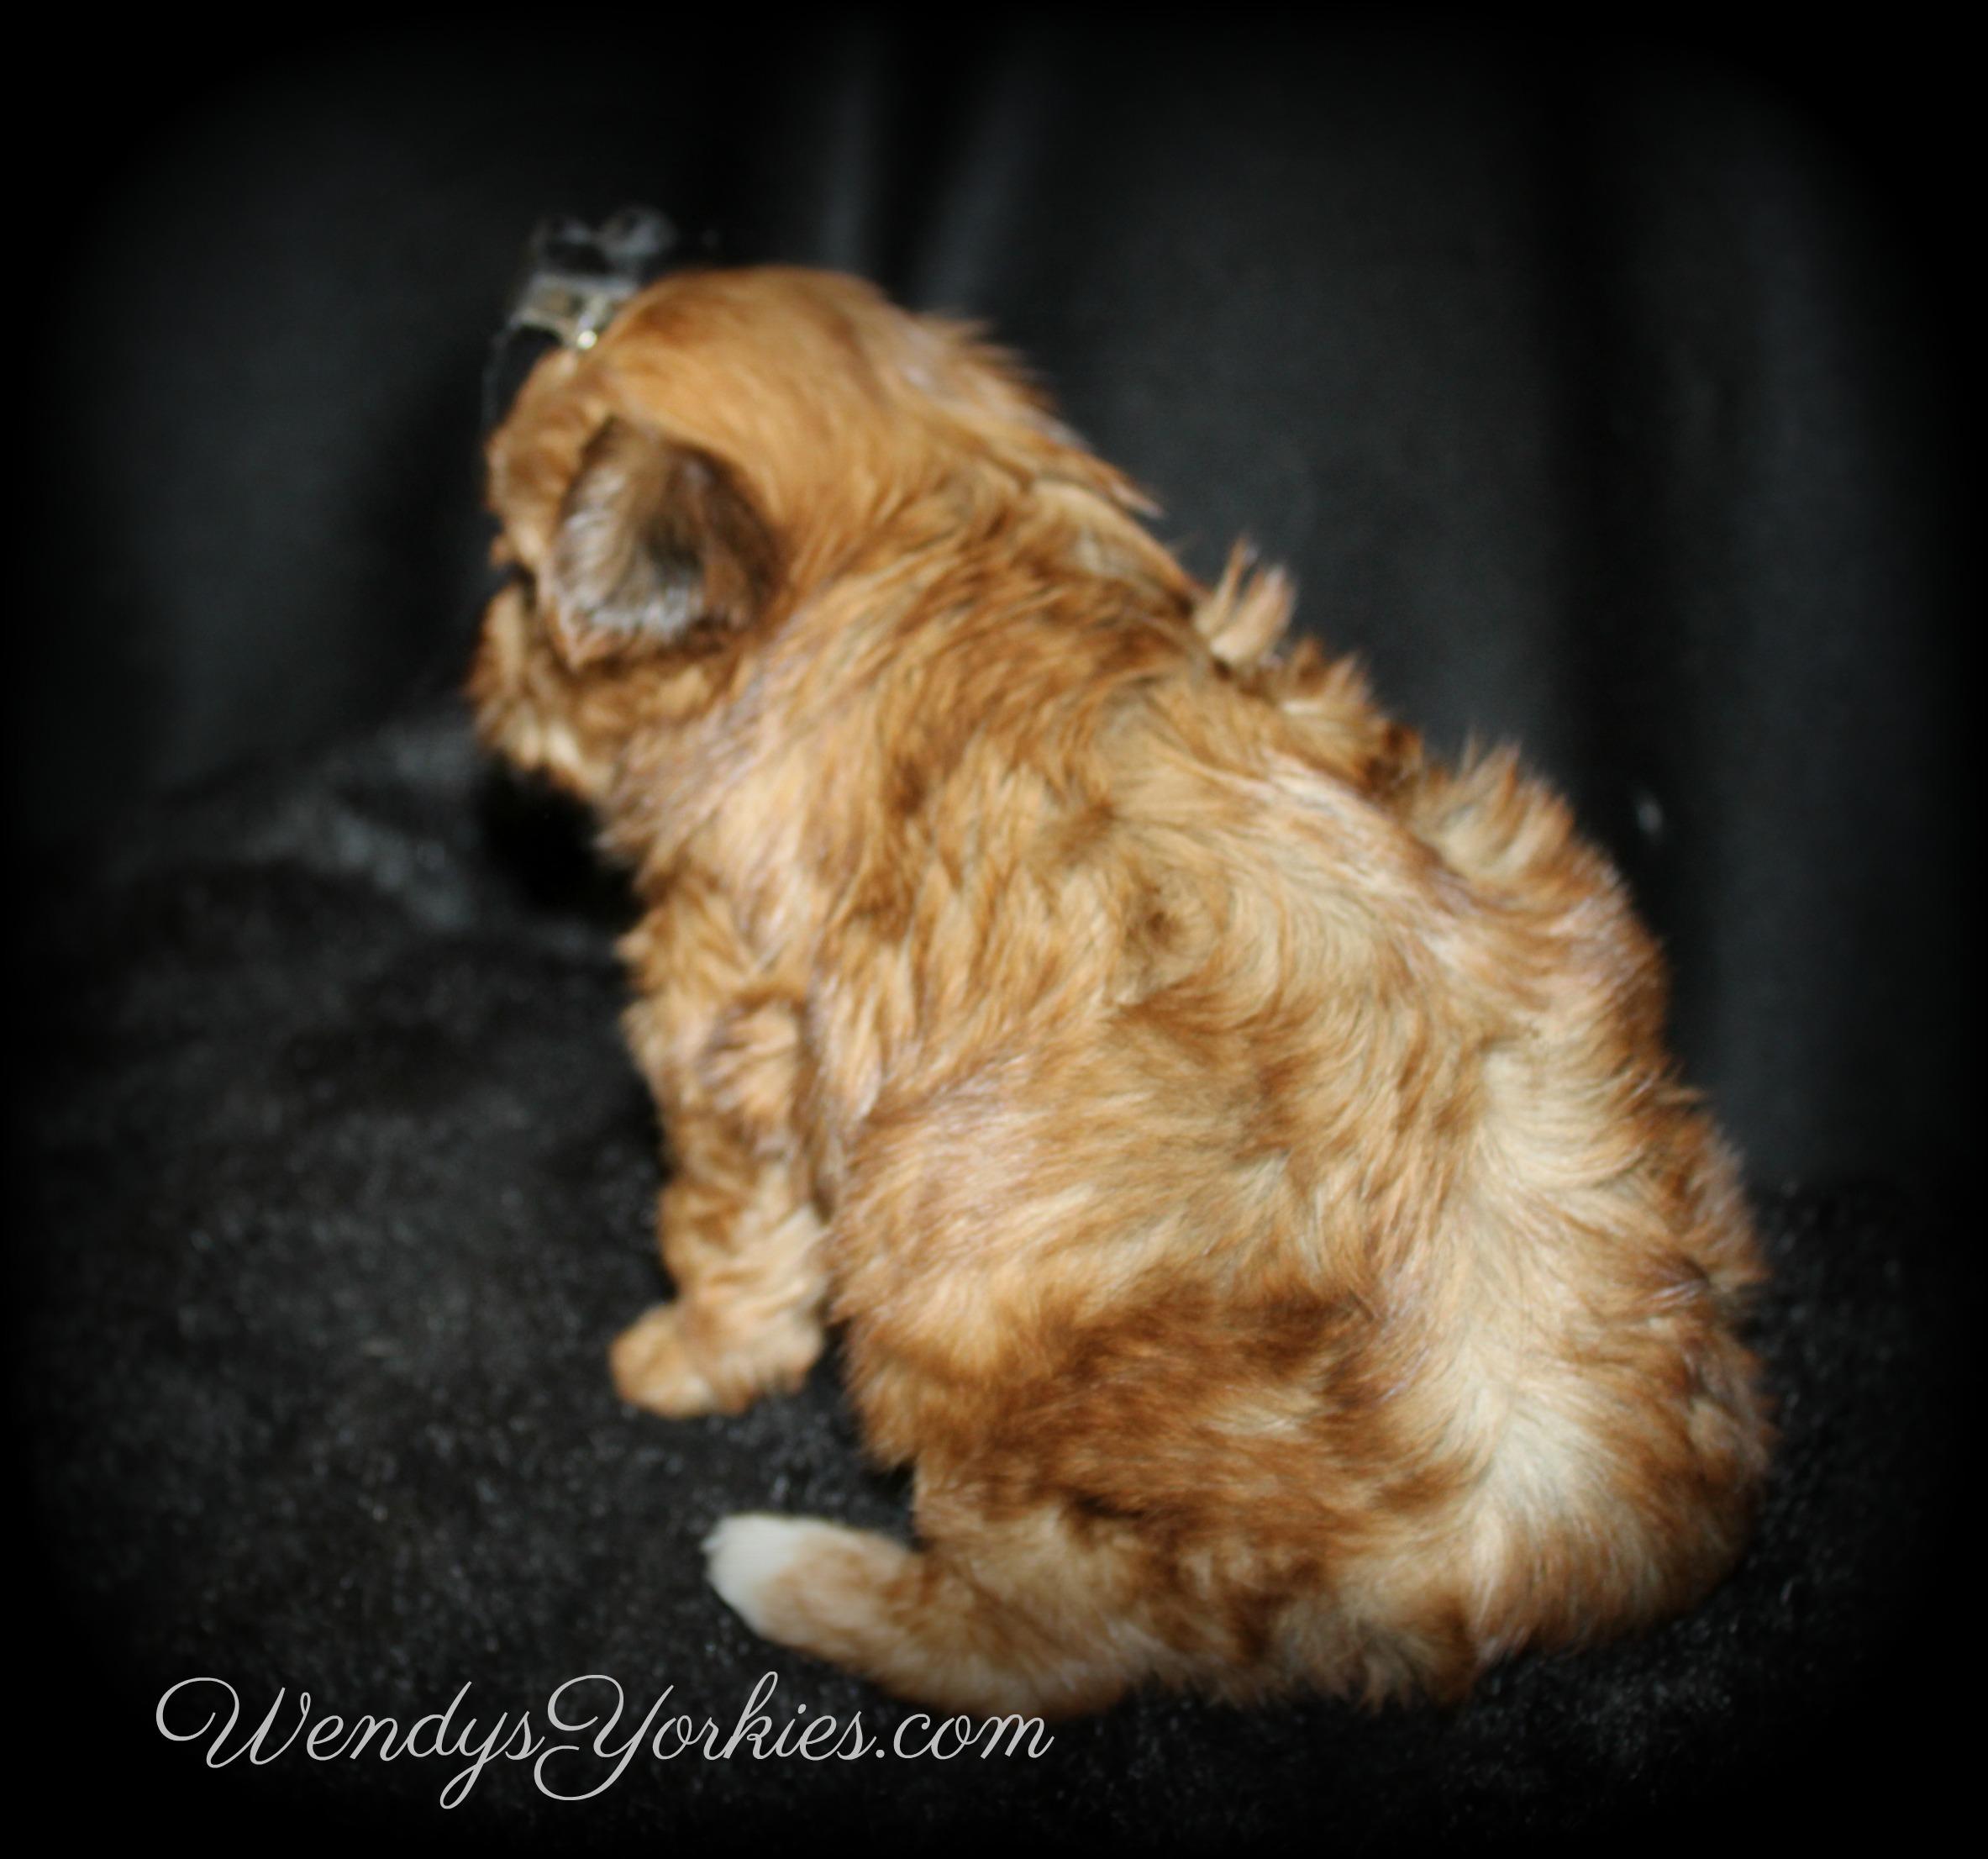 Gold Yorkie puppy, Lela m2, WendysYorkies.com